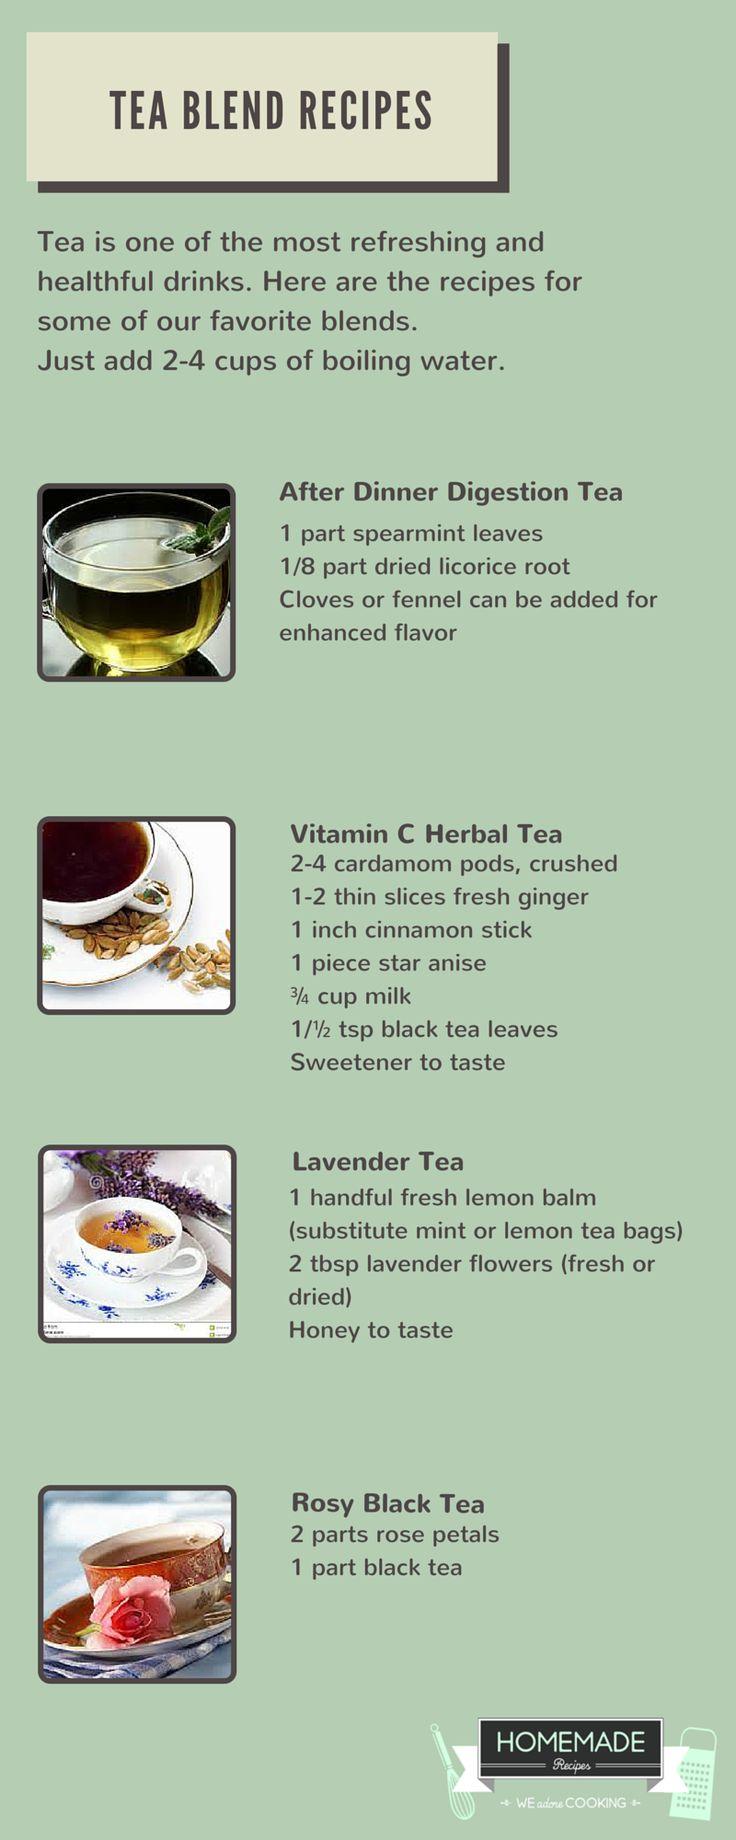 Digestion Tea, Vitamin C Tea, Lavender Tea & Rose Black Tea Blend Recipes by Homemade Recipes